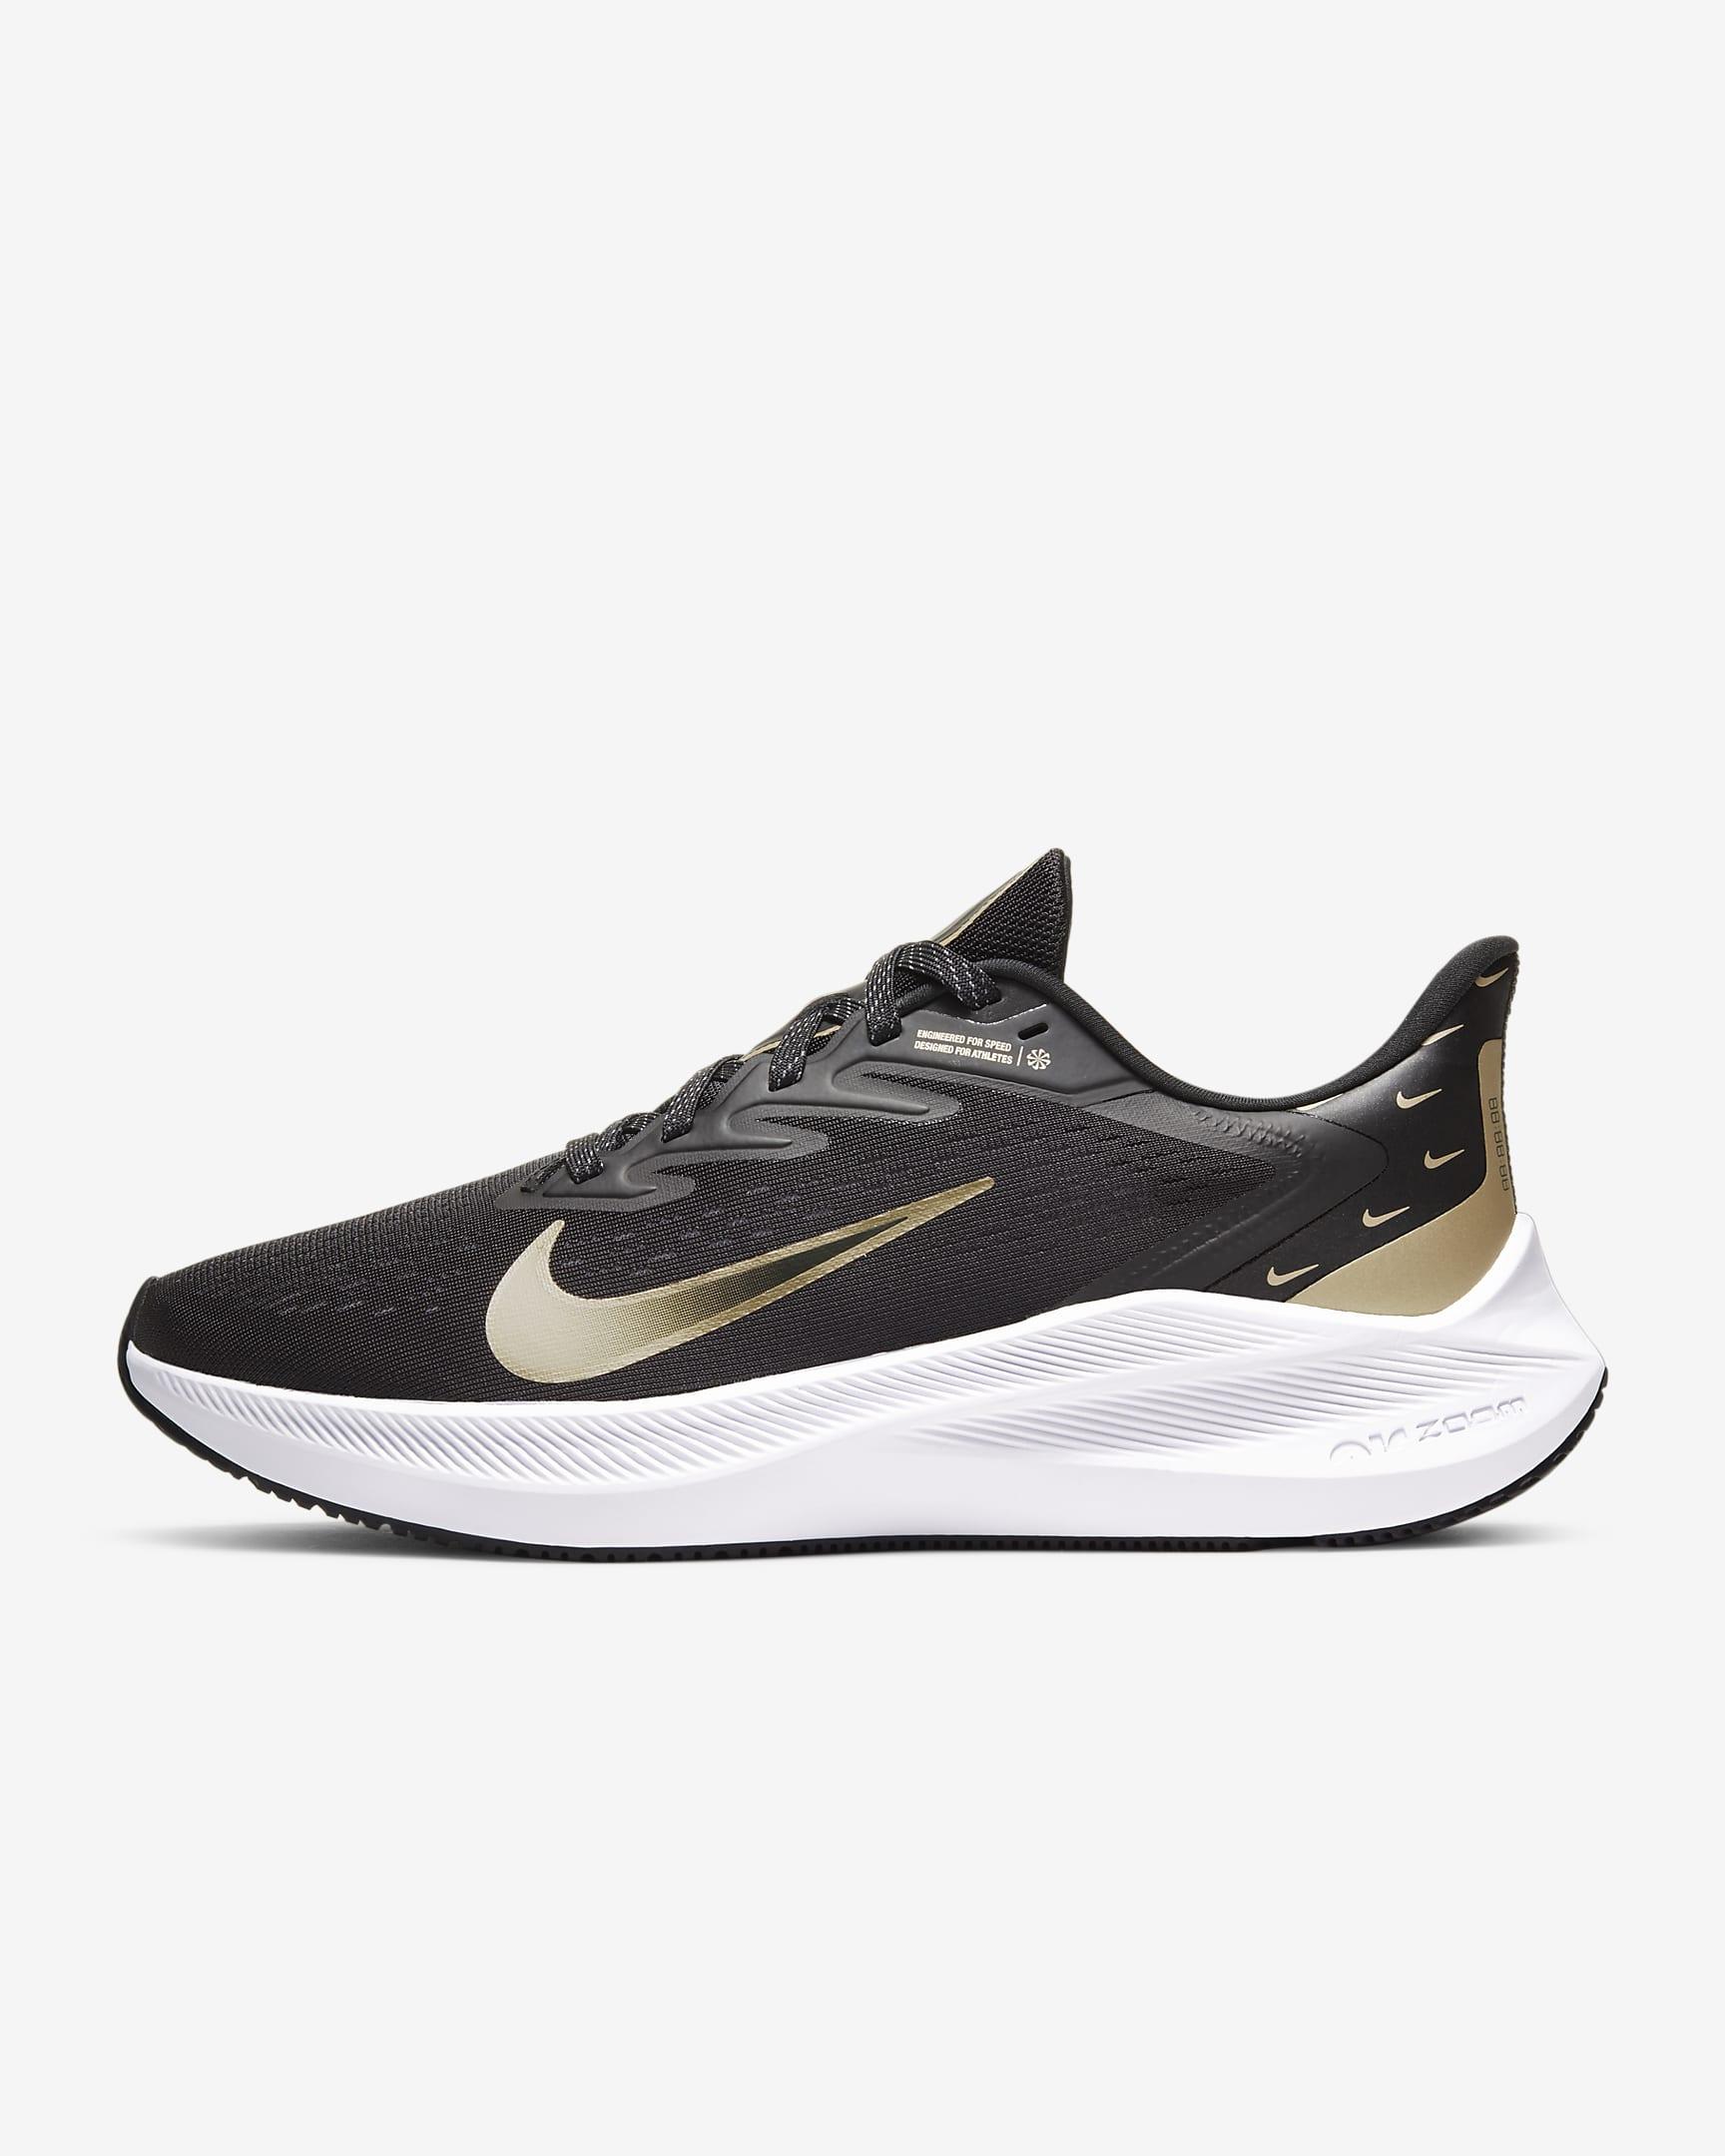 Nike Zoom Winflo 7 Premium For Women